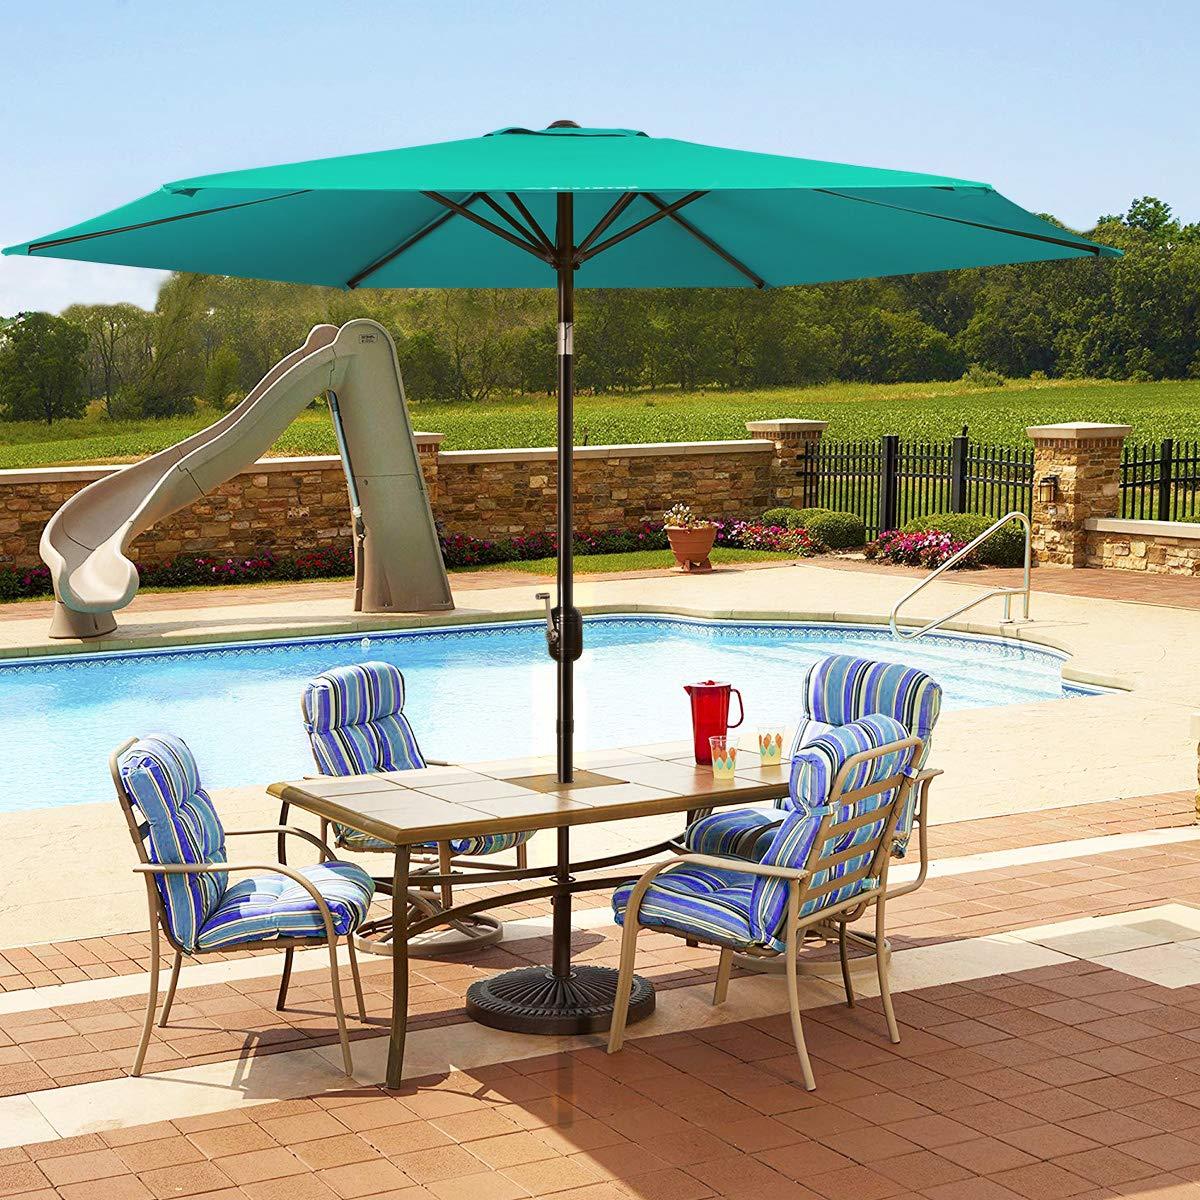 MOVTOTOP Patio Umbrella 9Ft UPF 50+ Premium Outdoor Table Umbrella, Market Umbrella with Push Button Tilt and Crank for Garden, Deck, Backyard, Pool (Green) by MOVTOTOP